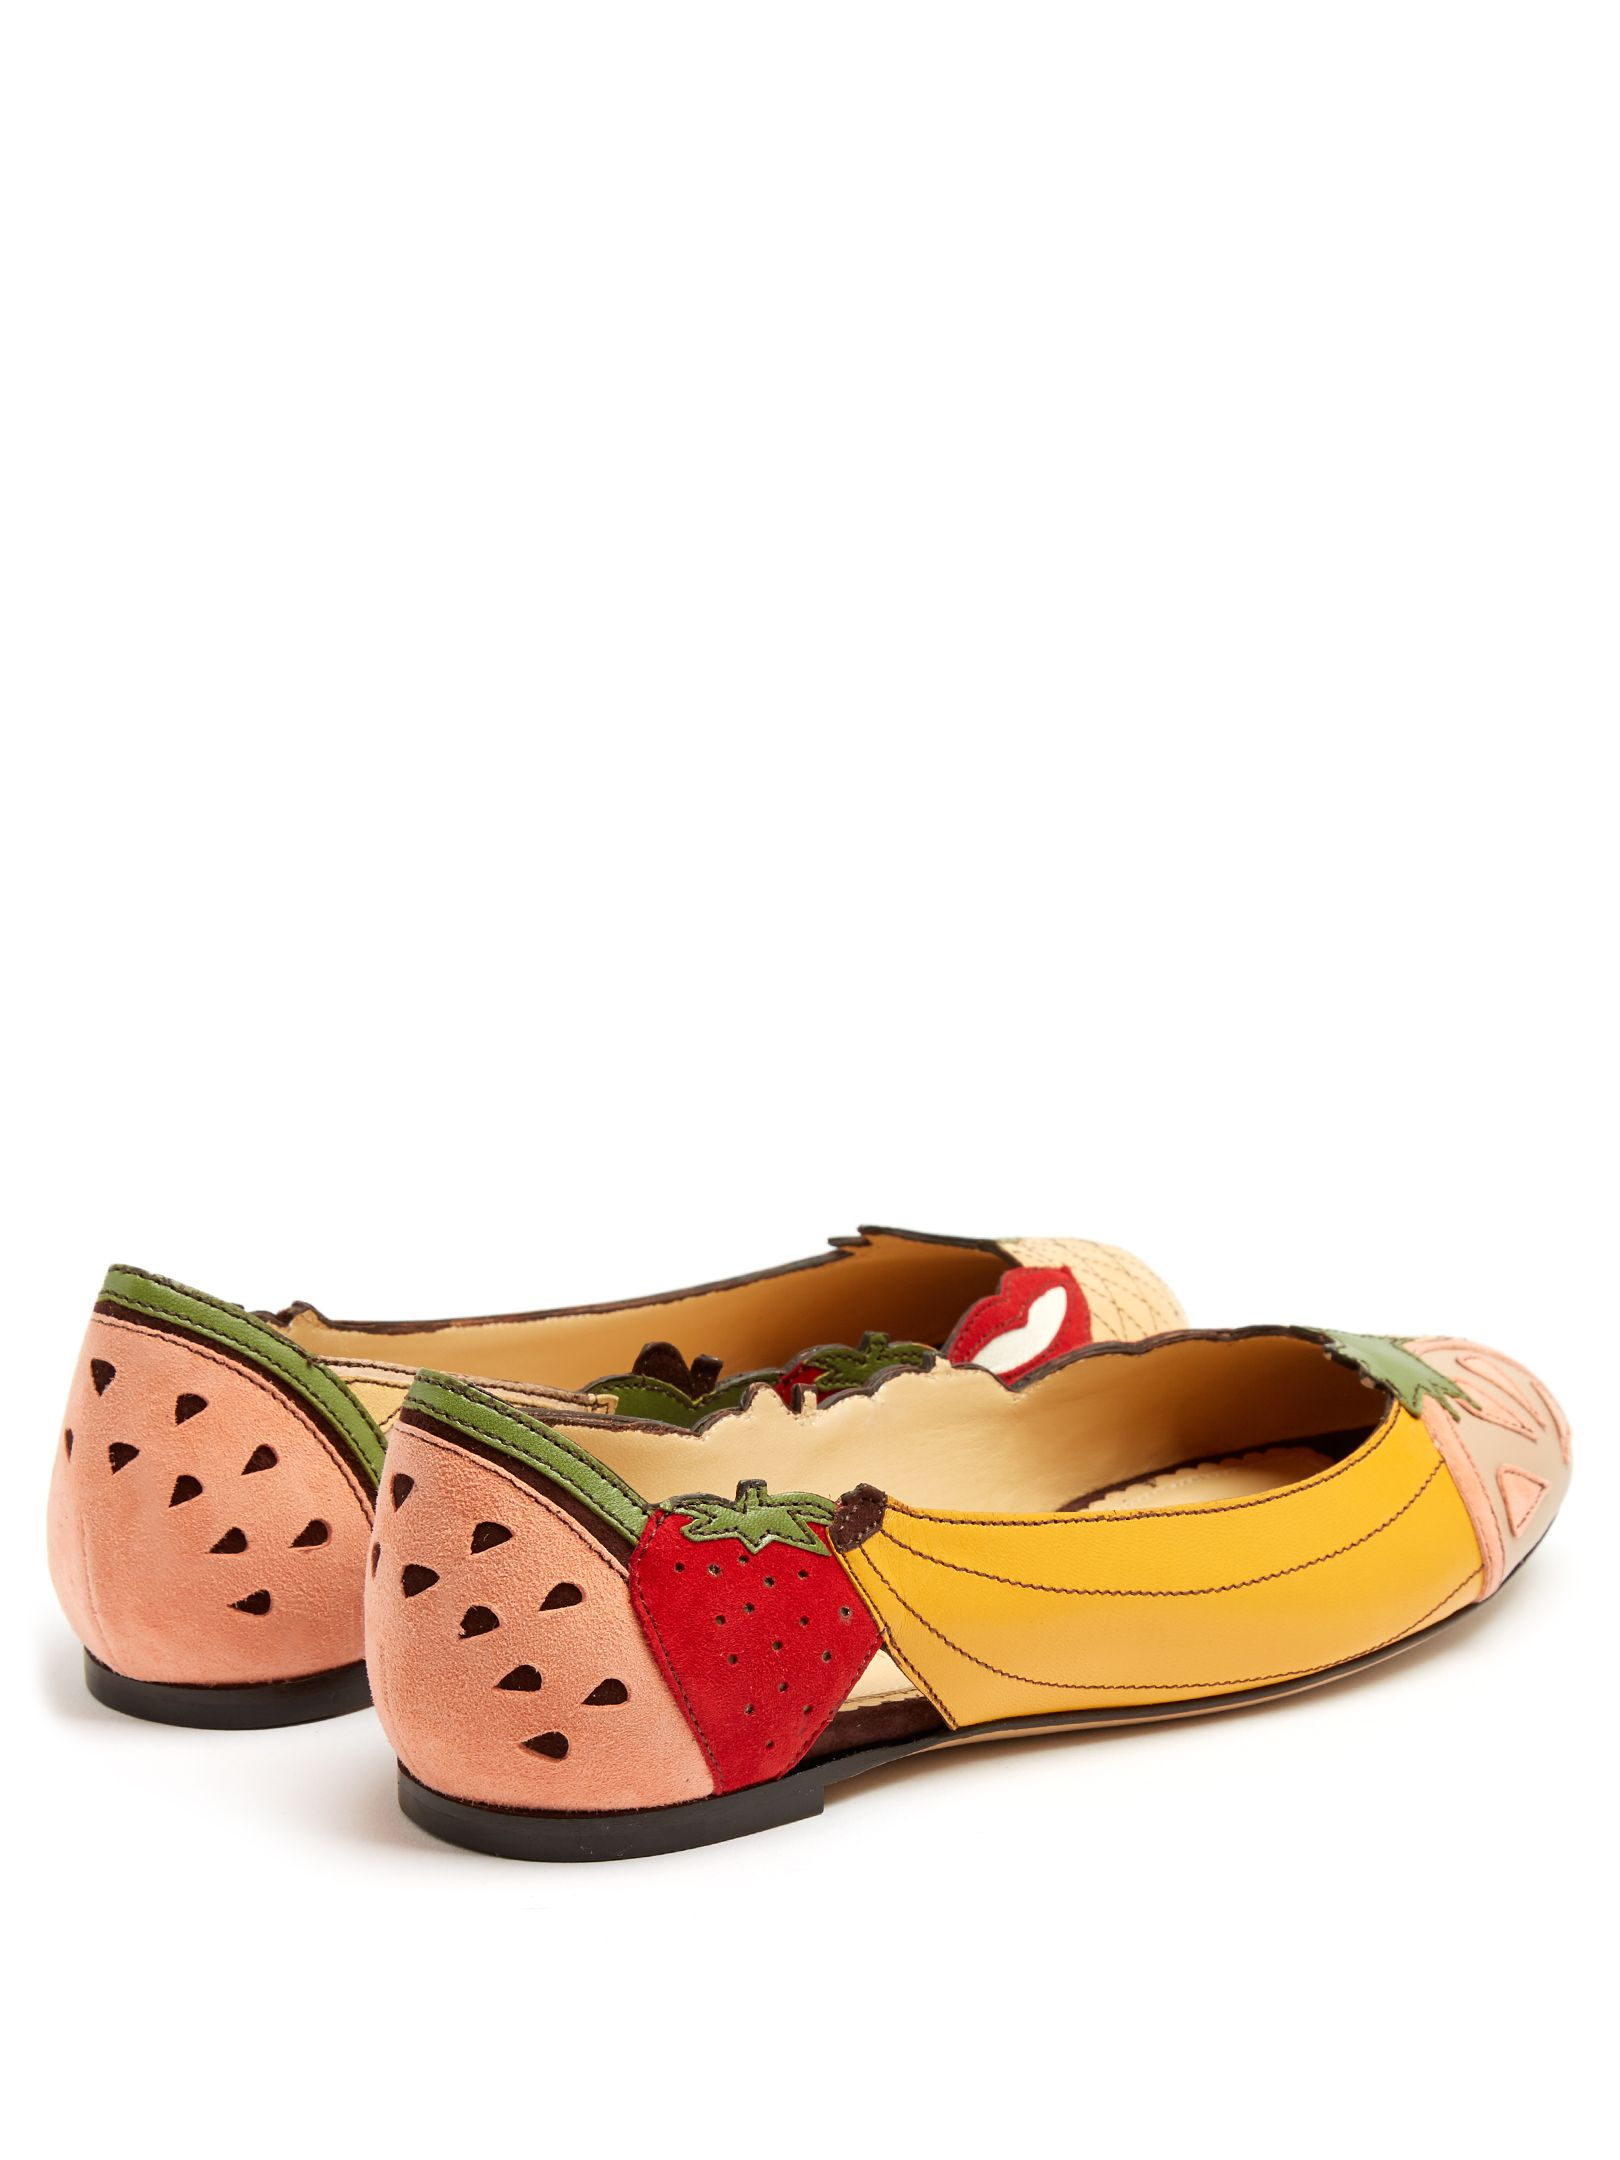 Tutti Frutti Flat Charlotte Olympia lFitm